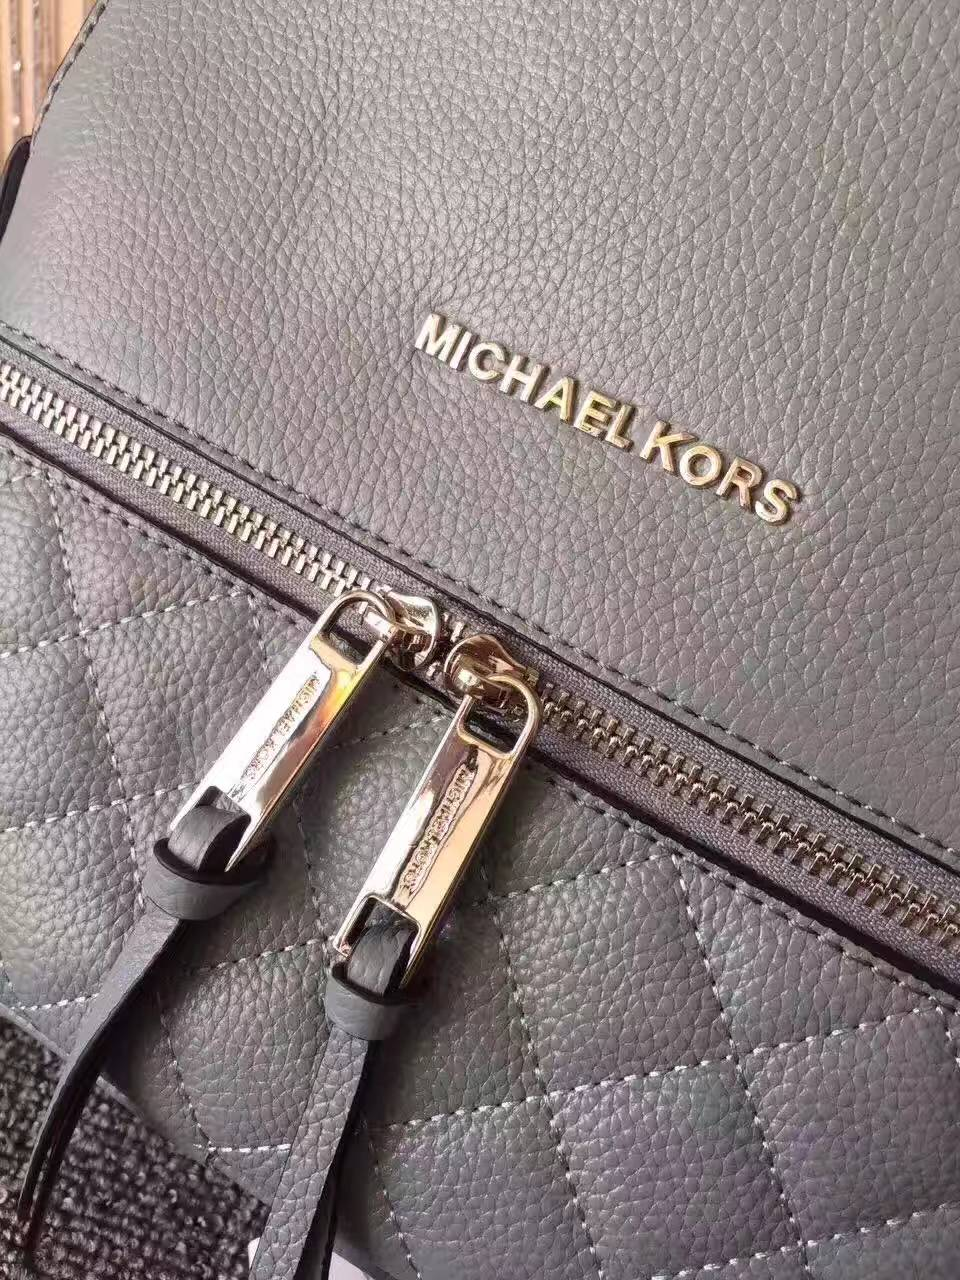 MK包包官网 迈克高仕灰蓝色进口牛皮绣线新款双肩包后背包27*30cm